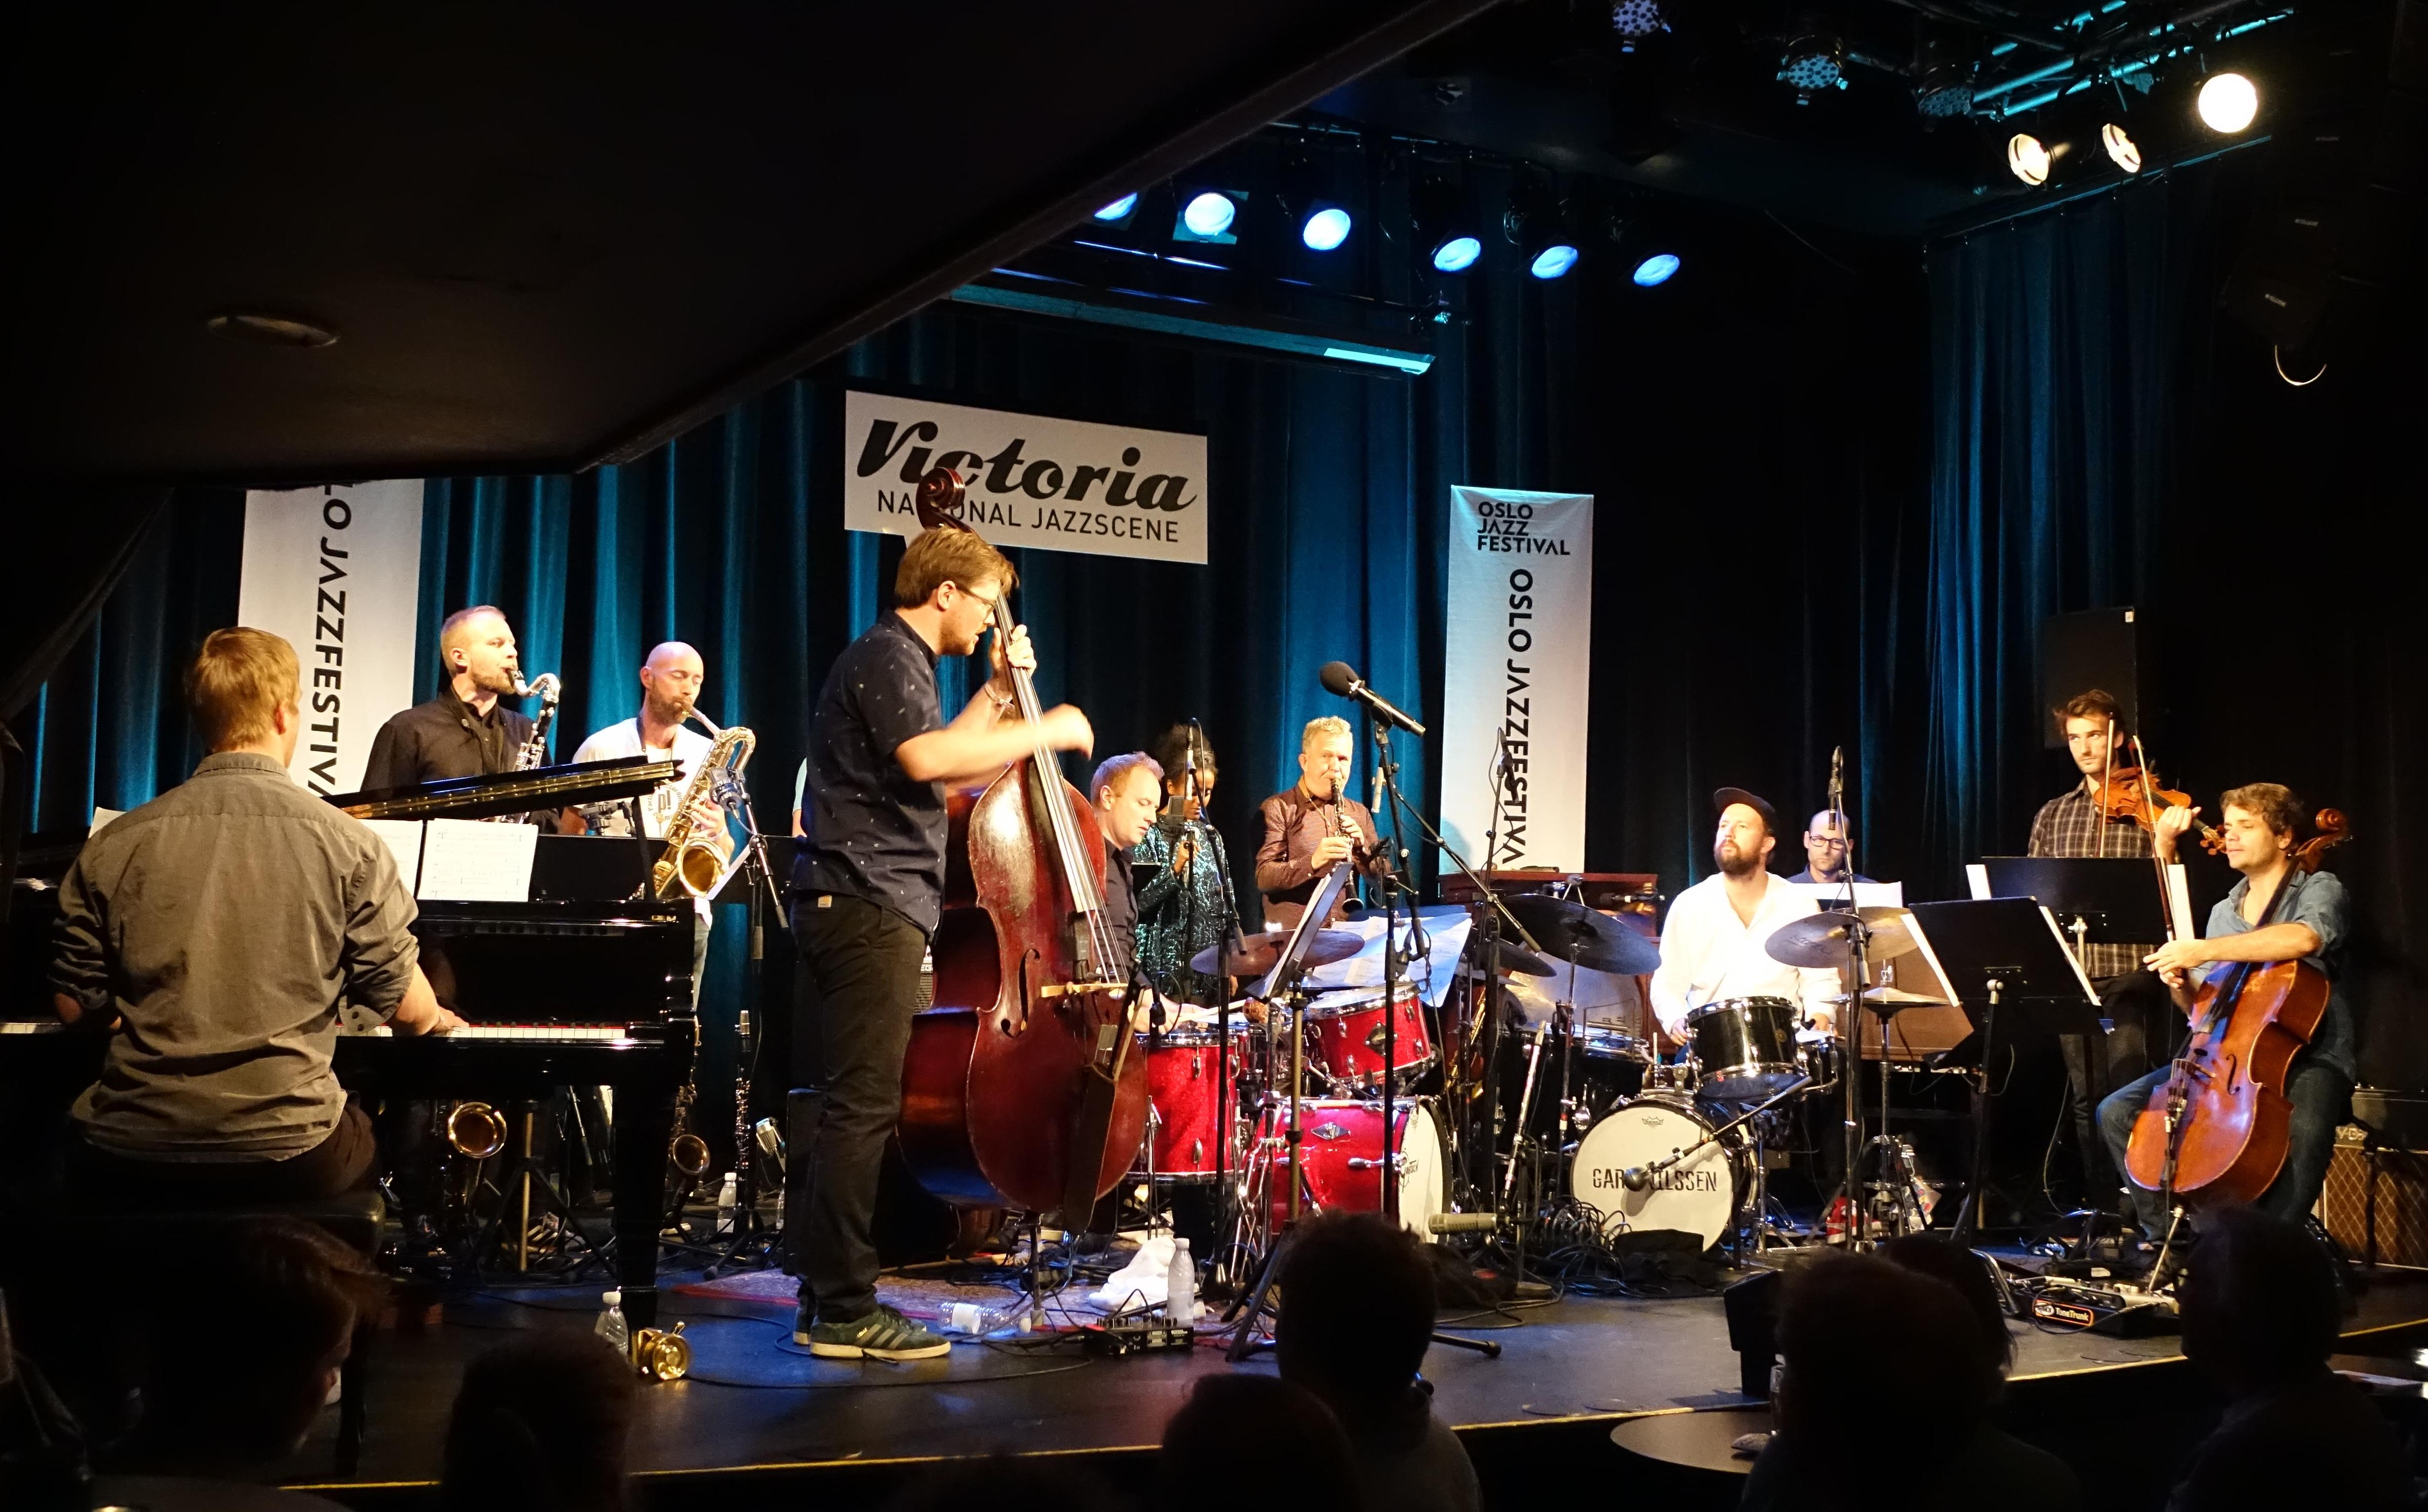 The Trondheim Jazz Orchestra at Nasjonal Jazzscene Victoria, Oslo in August 2018